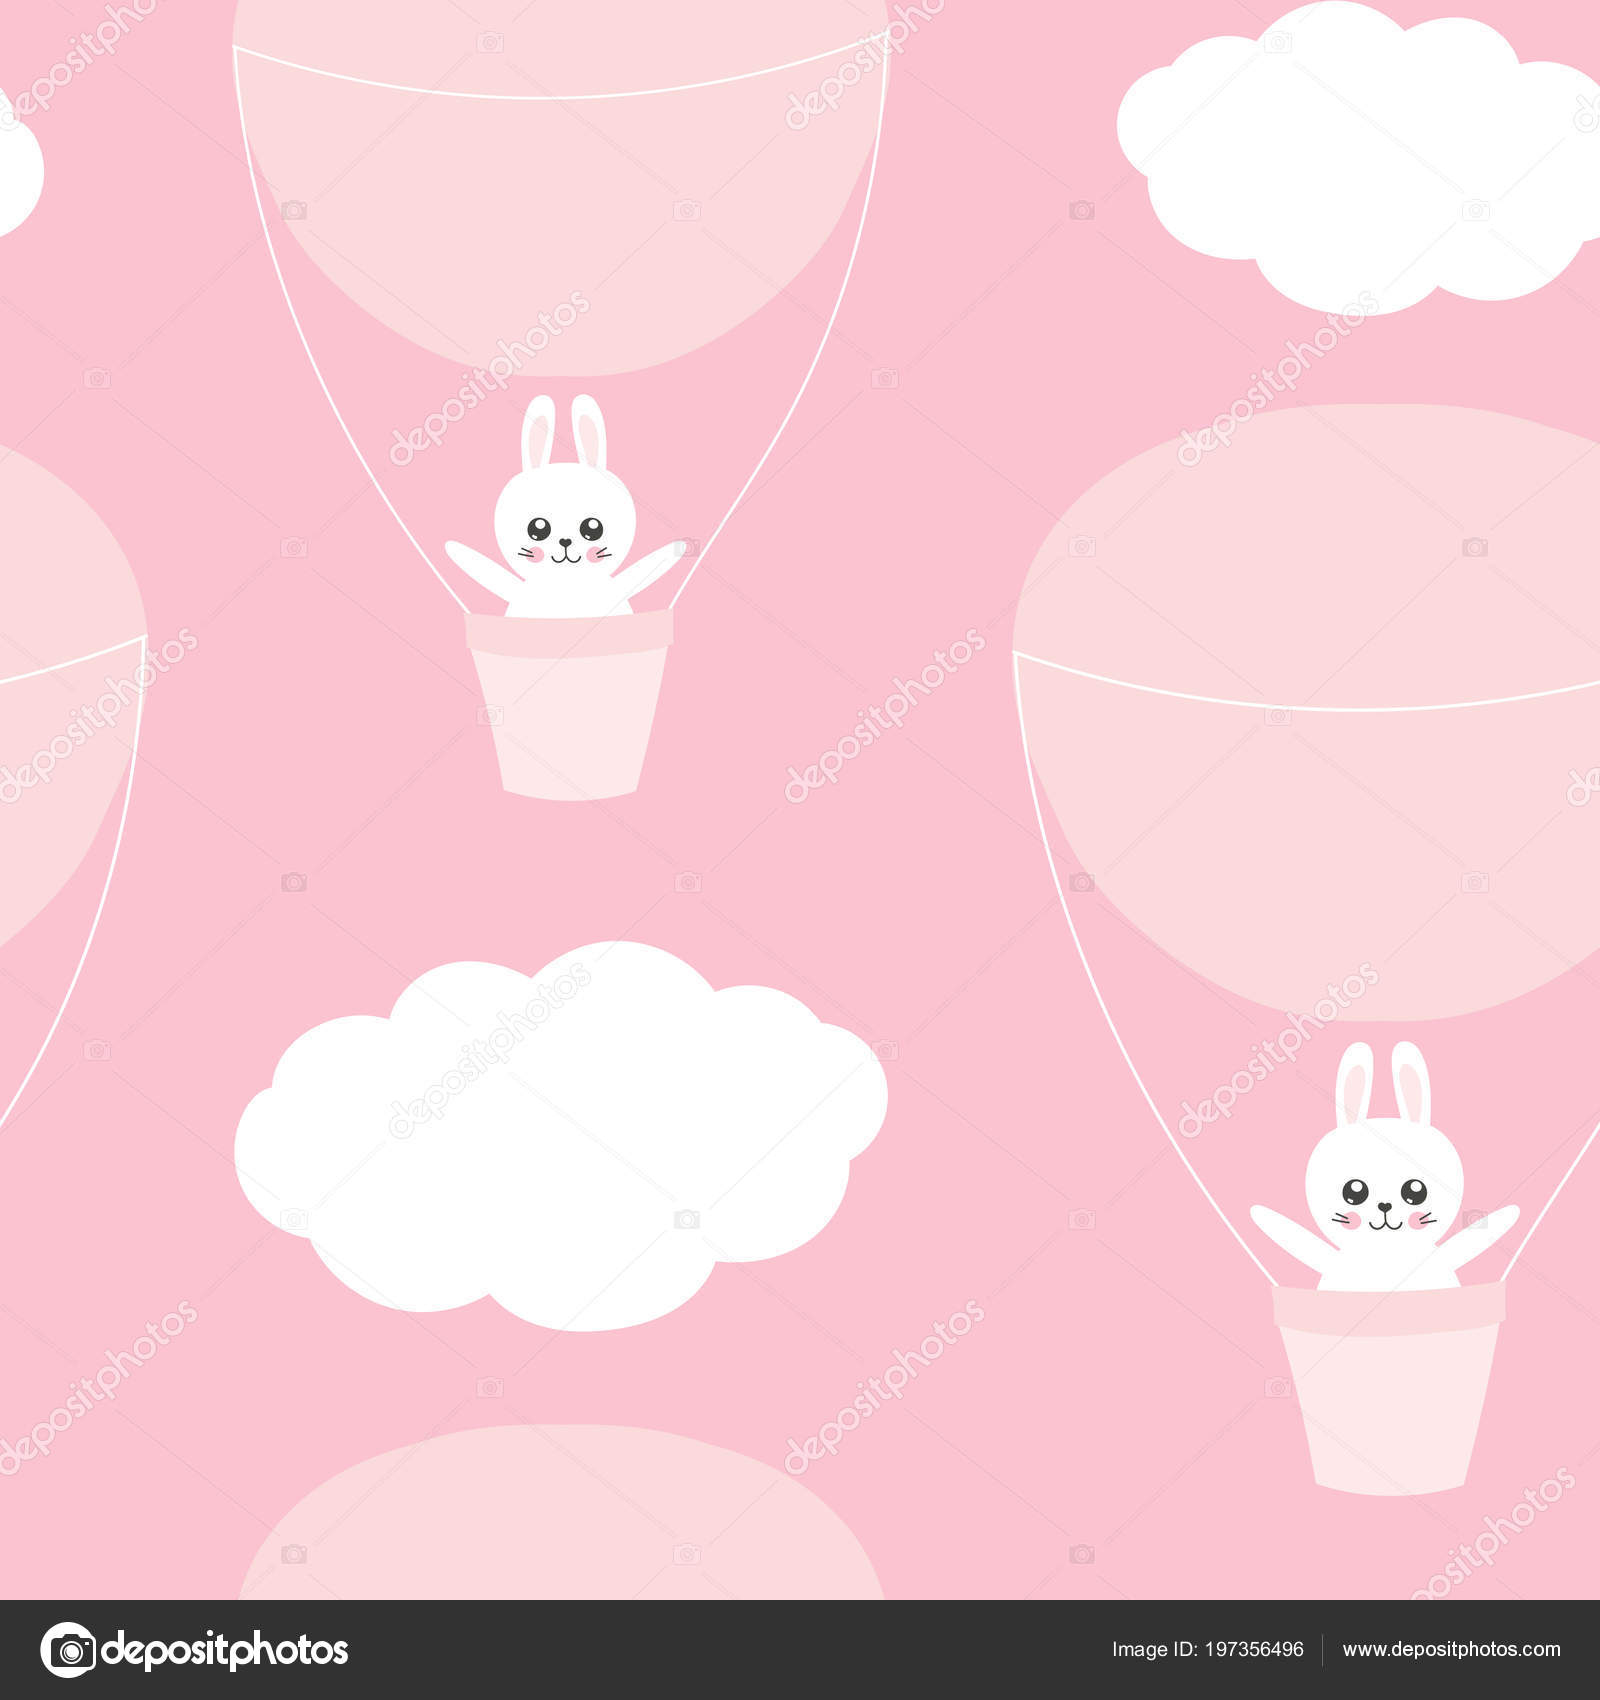 Modele Bebe Mignon Avec Petit Lapin Dessin Anime Animaux Fille